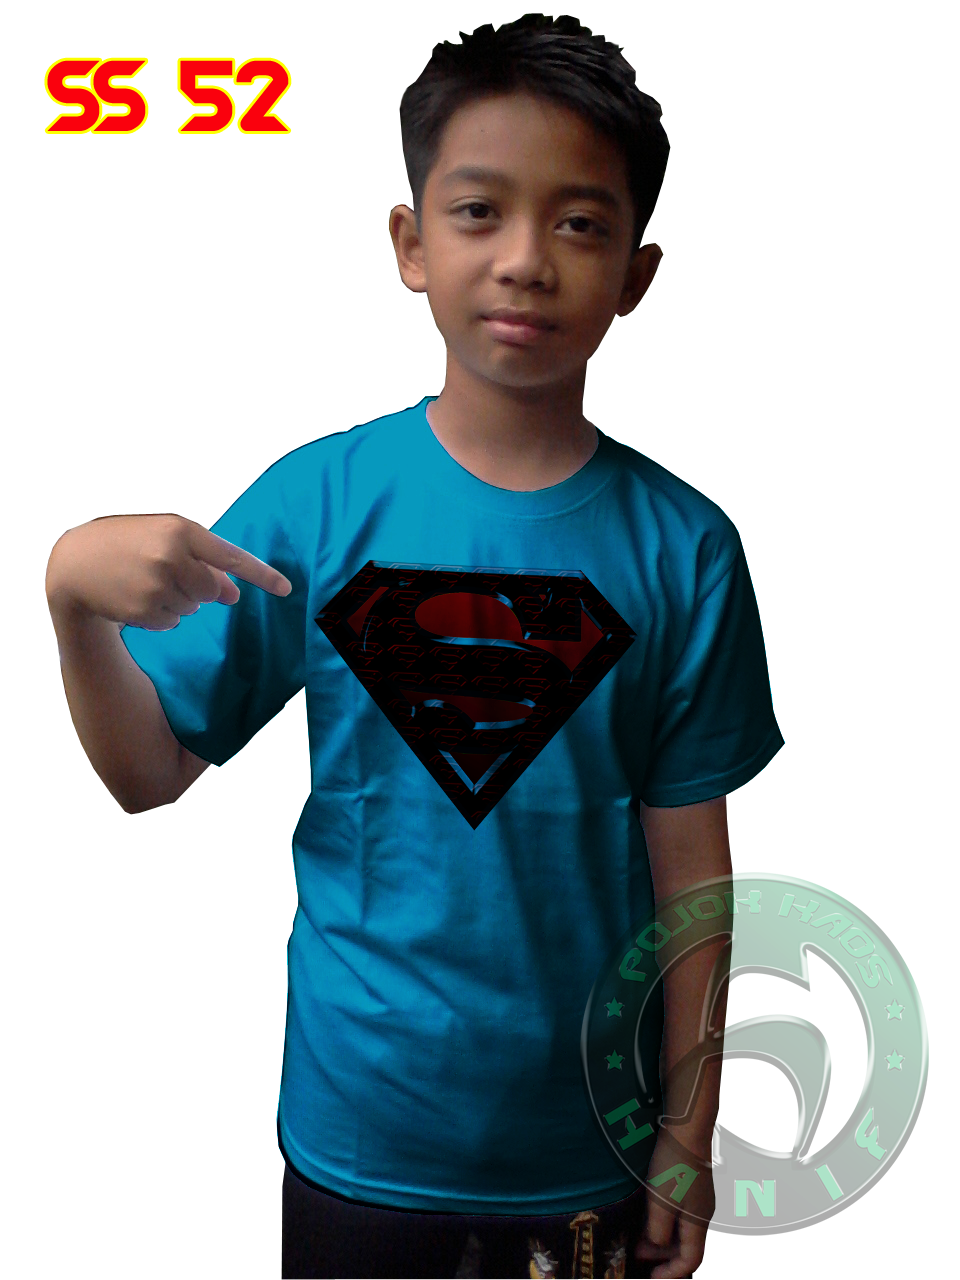 http://pojokkaoshanif.blogspot.com/2014/08/kaos-logo-superman.html